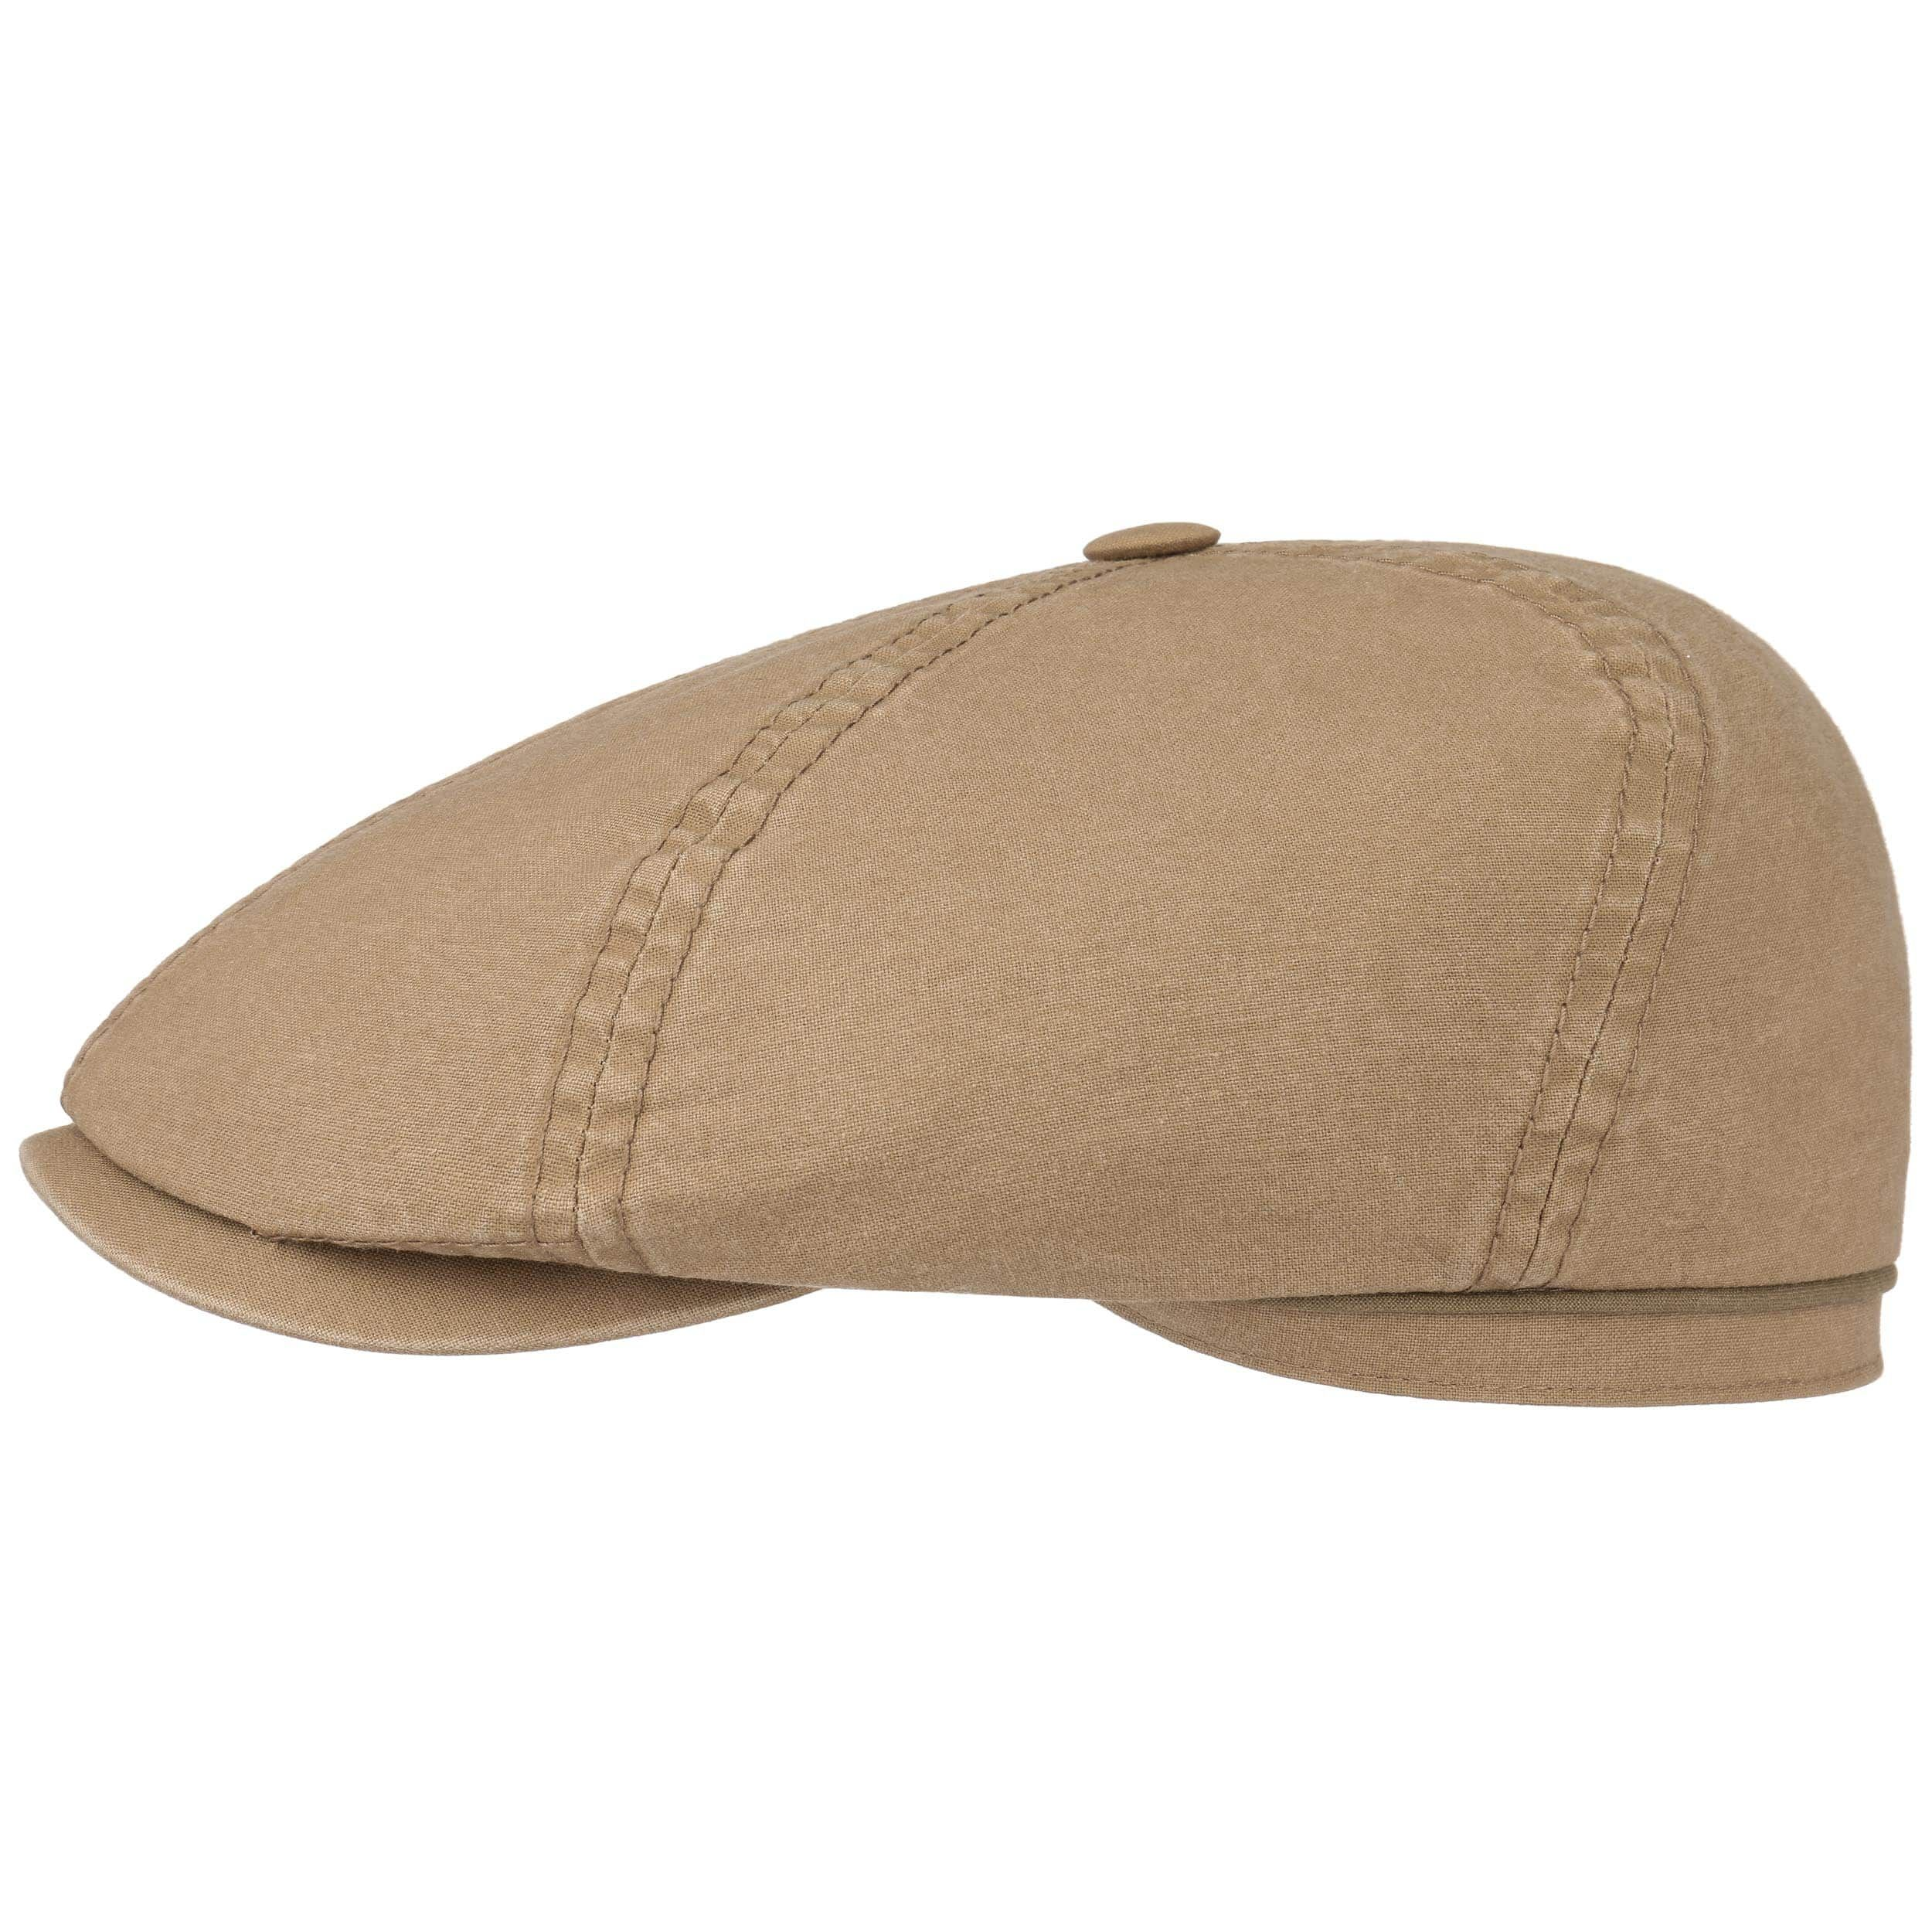 Delave Organic Cotton Flatcap dunkelbeige